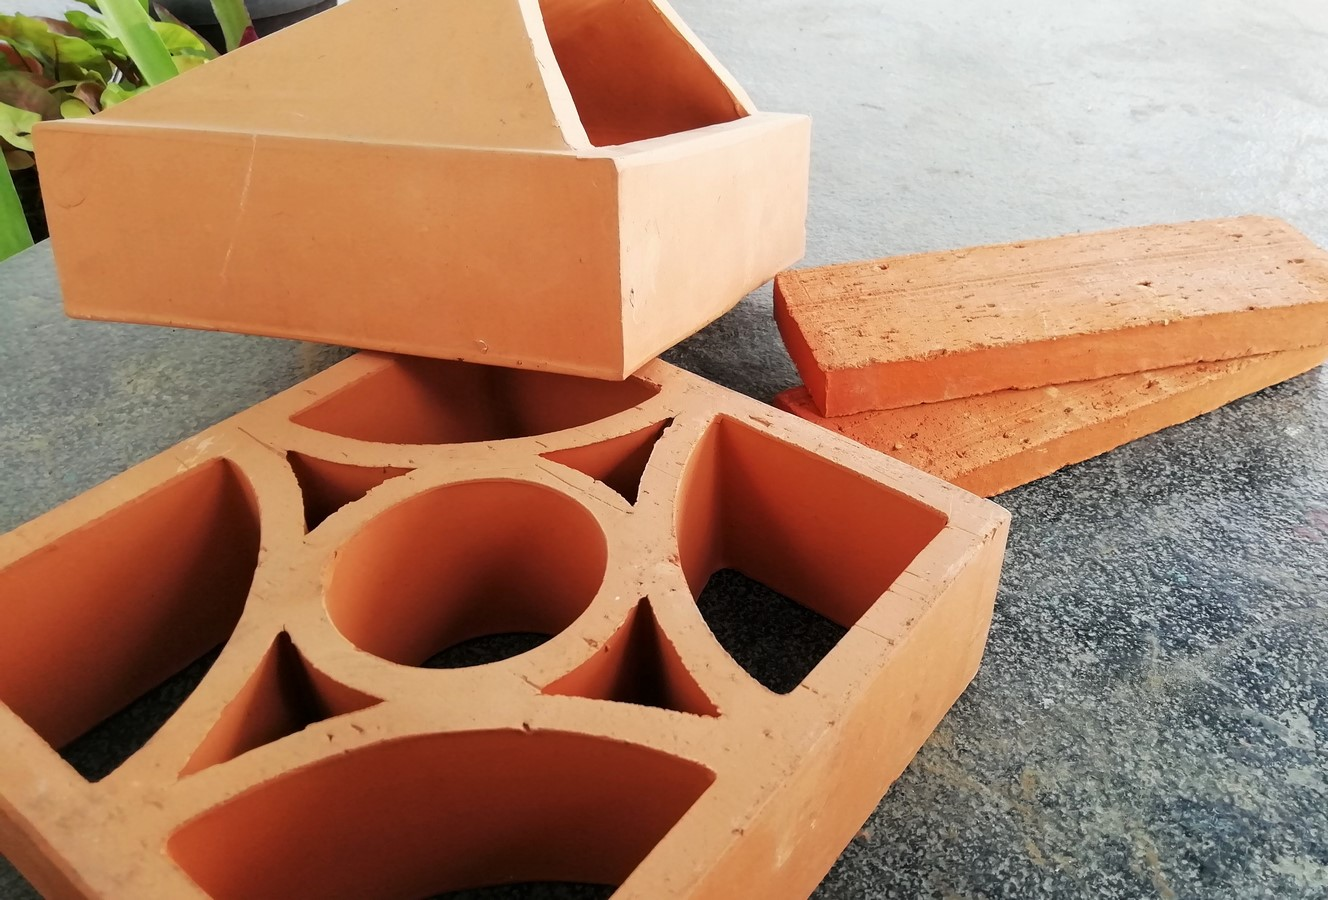 10 Building Materials for Interiors- 2021 Sheet15